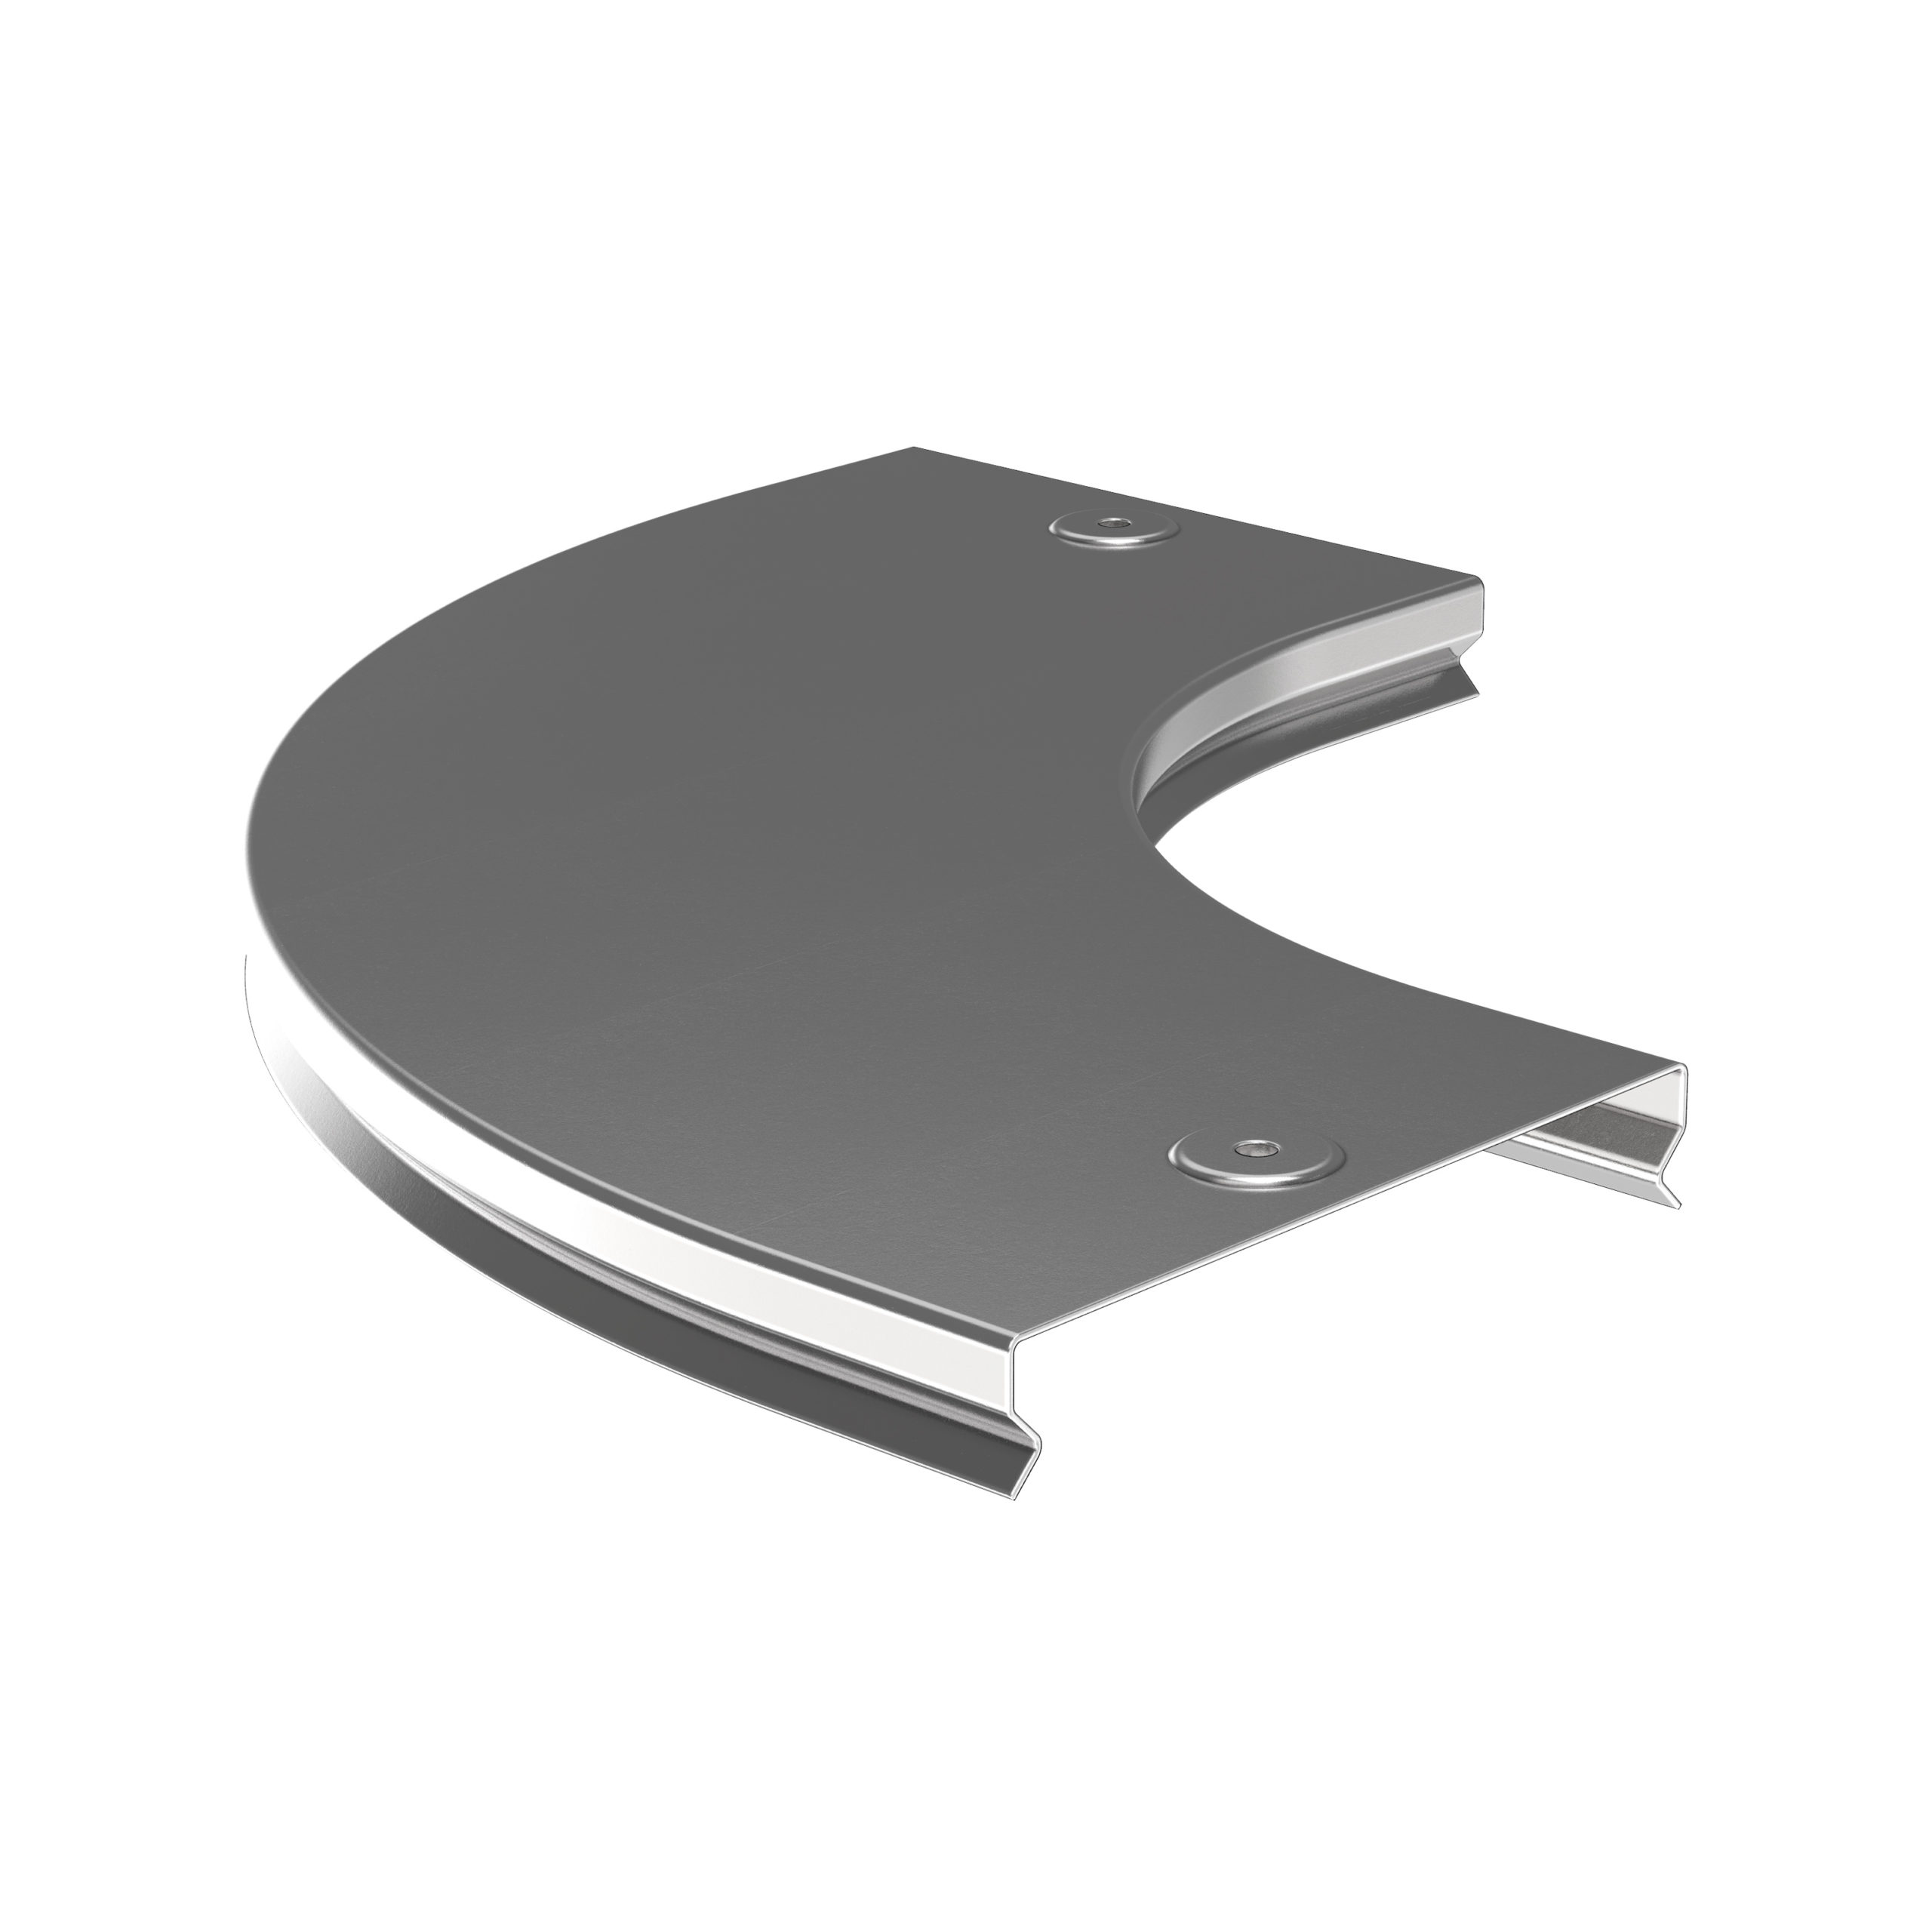 Крышка поворота плавного 90град (тип Г01) ESCA 200мм IEK 1